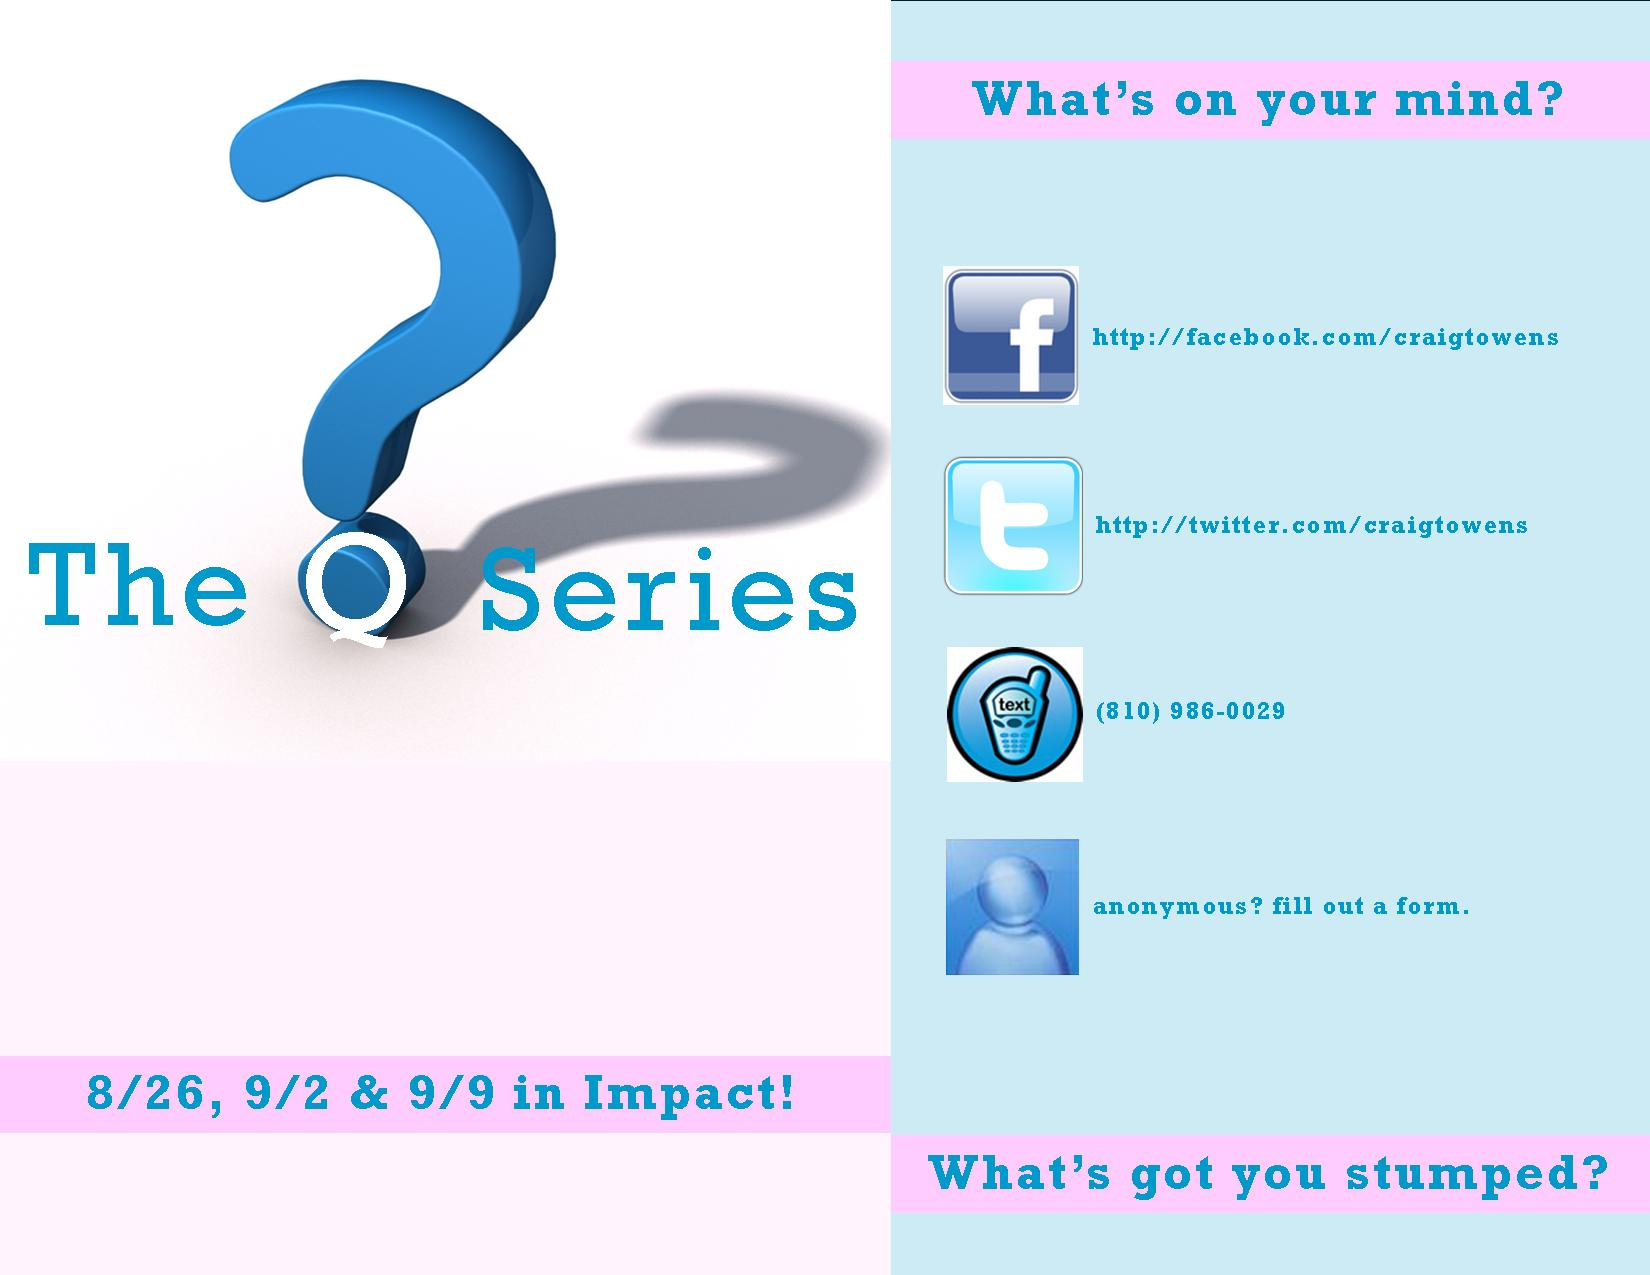 The Q Series